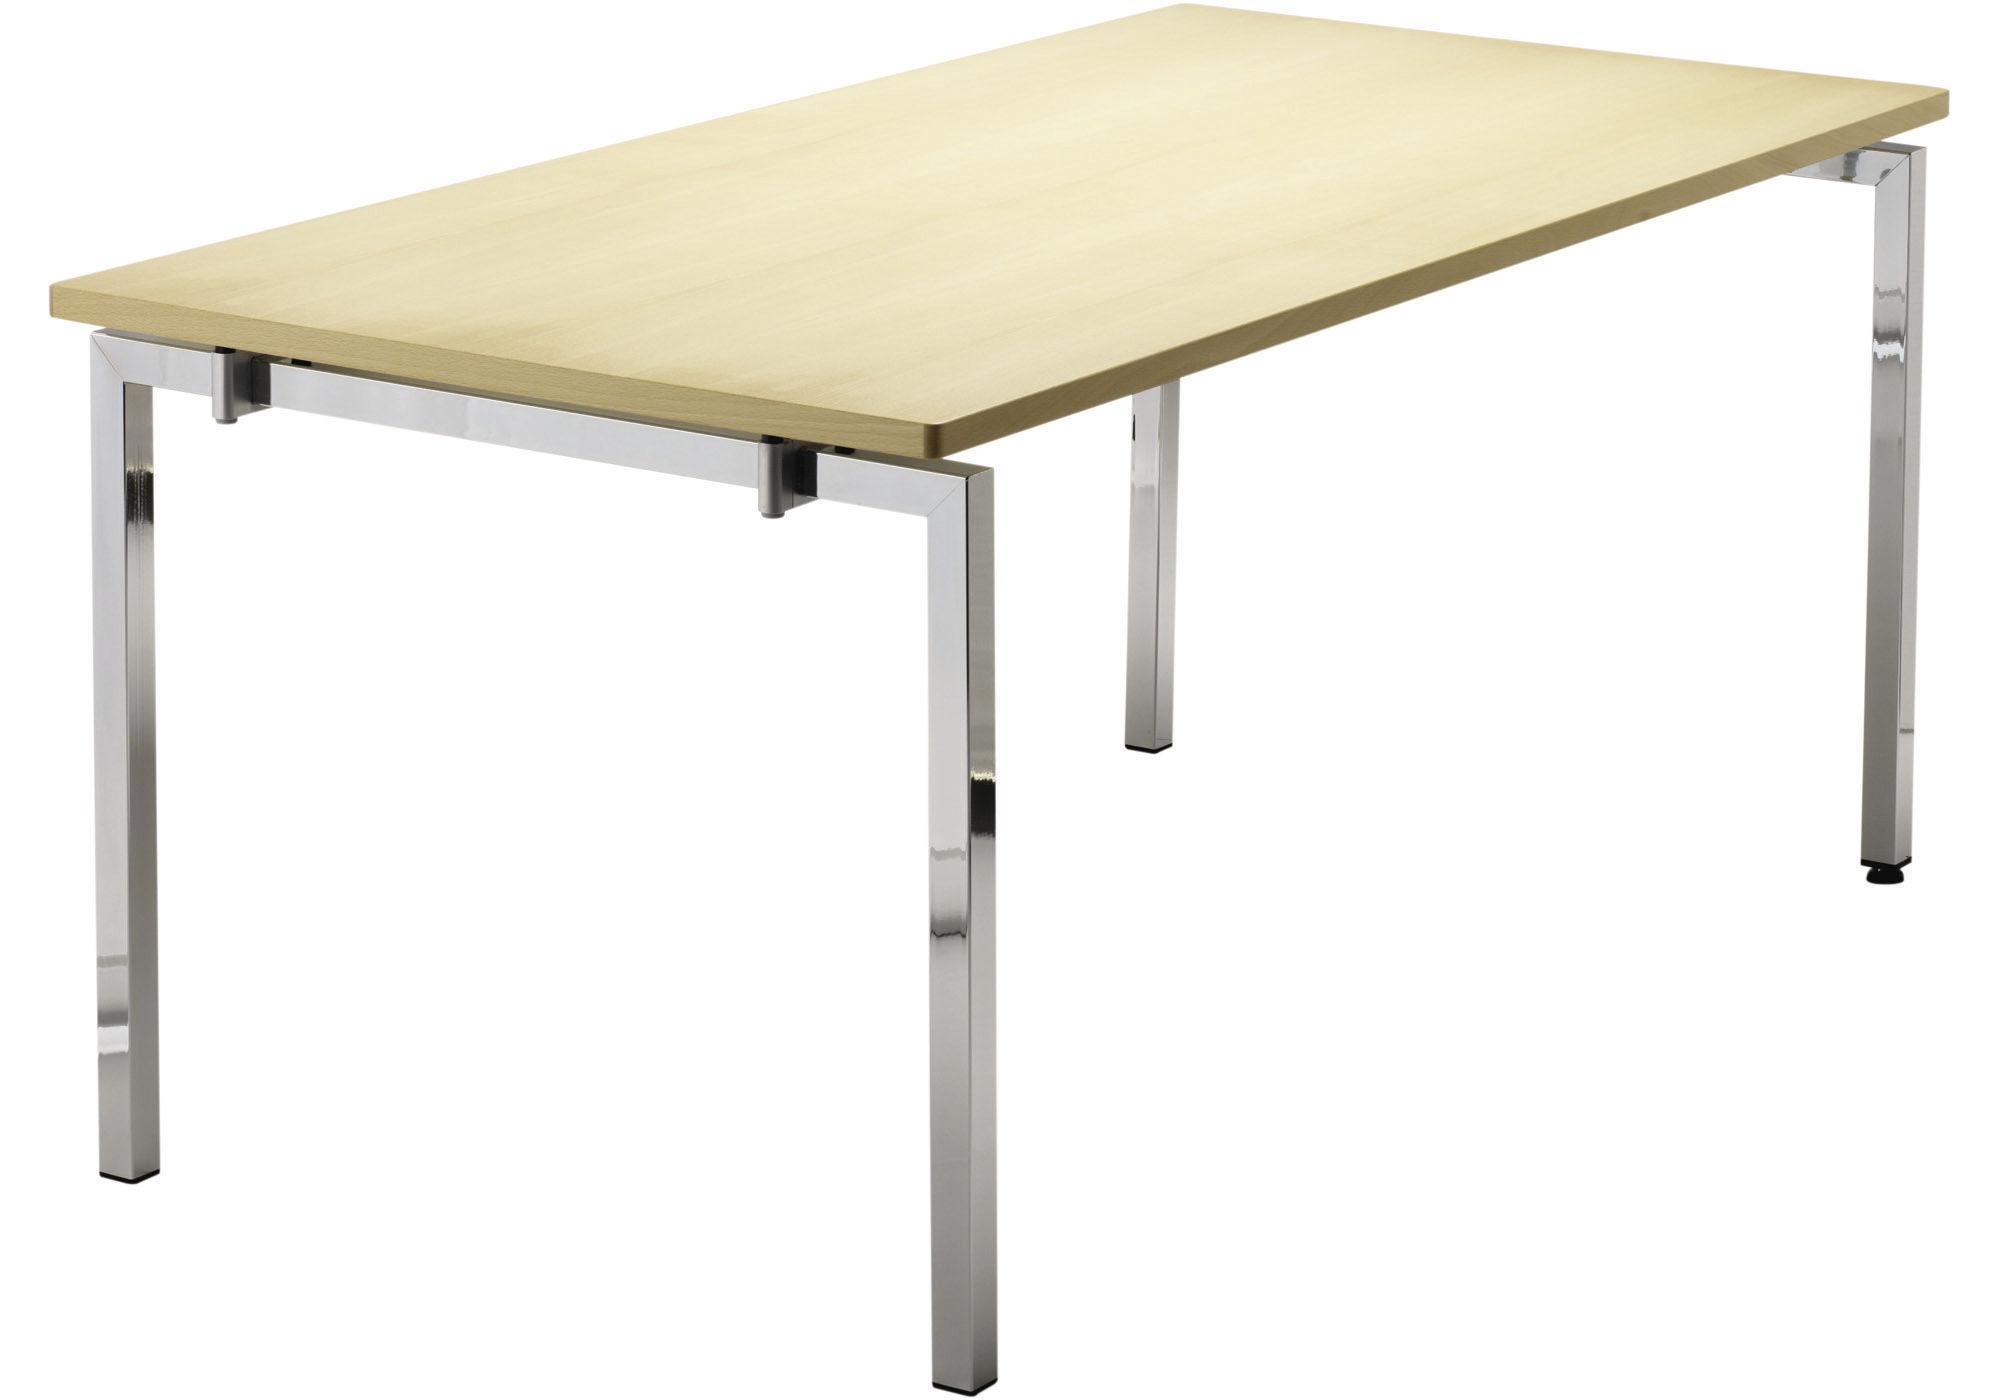 Ordinaire ... Contemporary Table / Maple / Rectangular / Folding